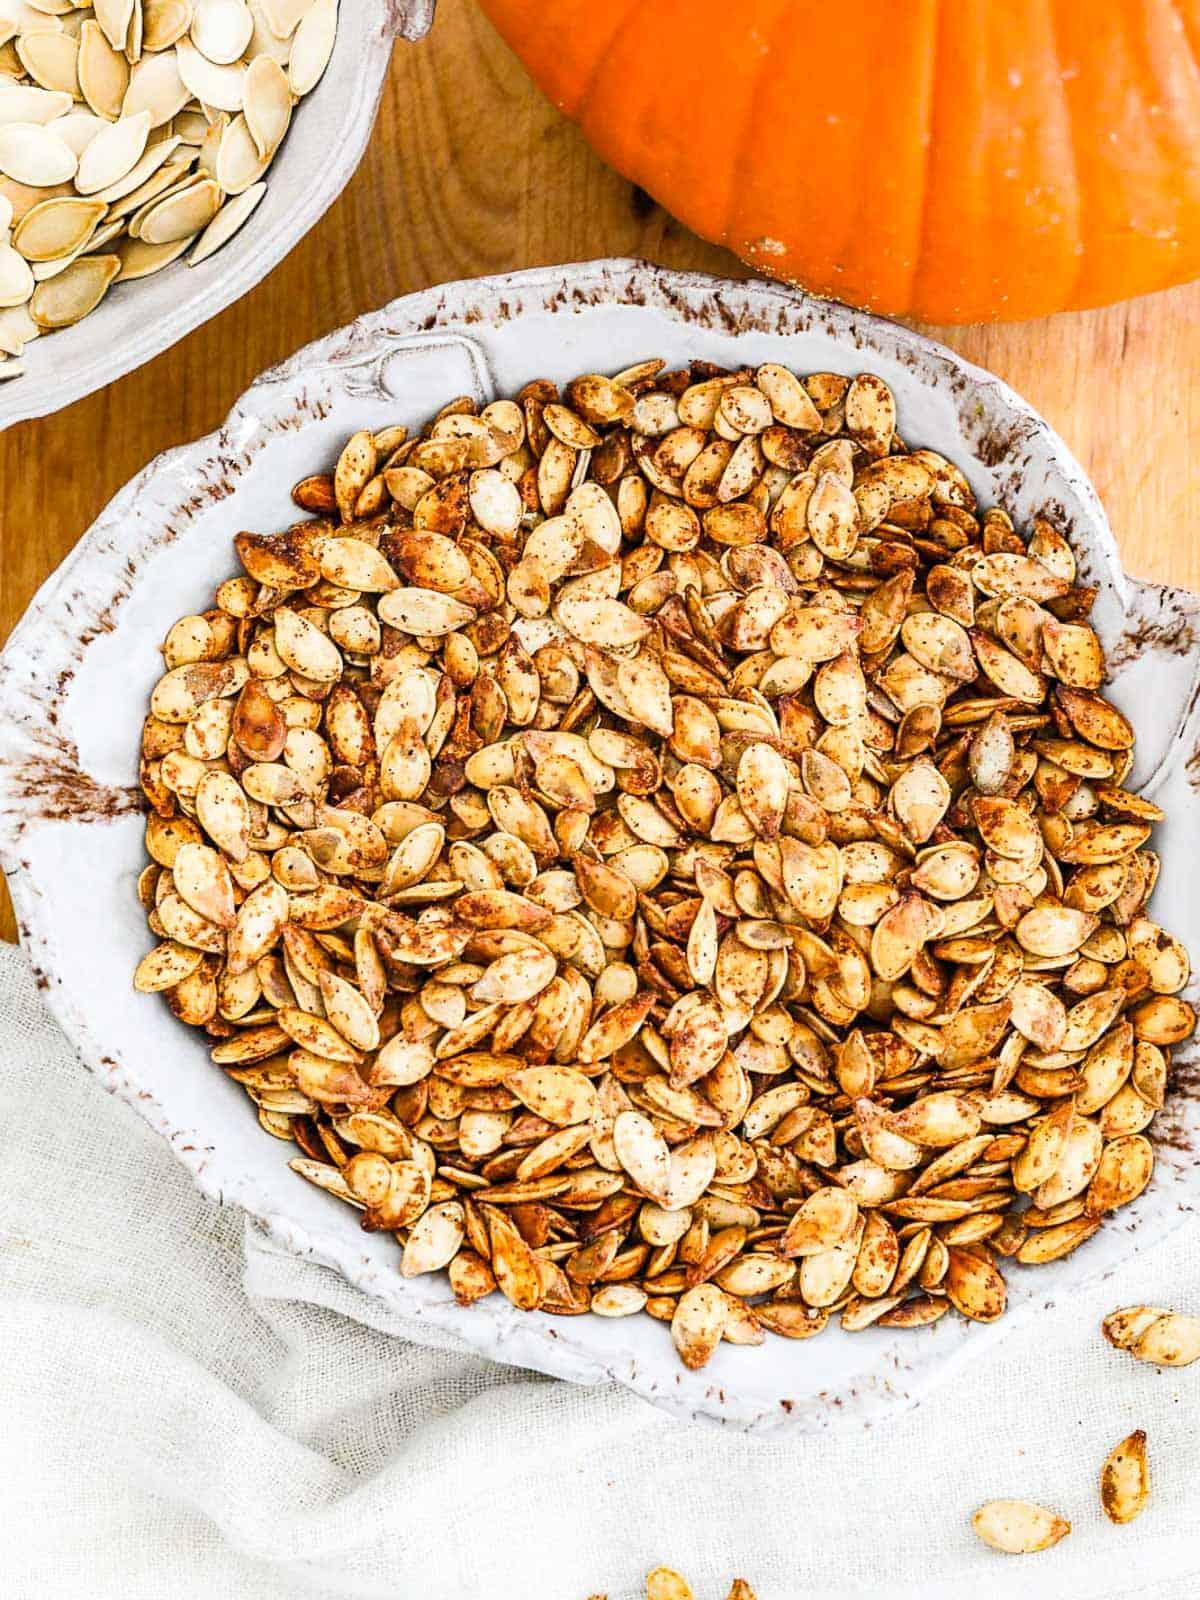 A ceramic bowl filled with seasoned roast pumpkin seeds.